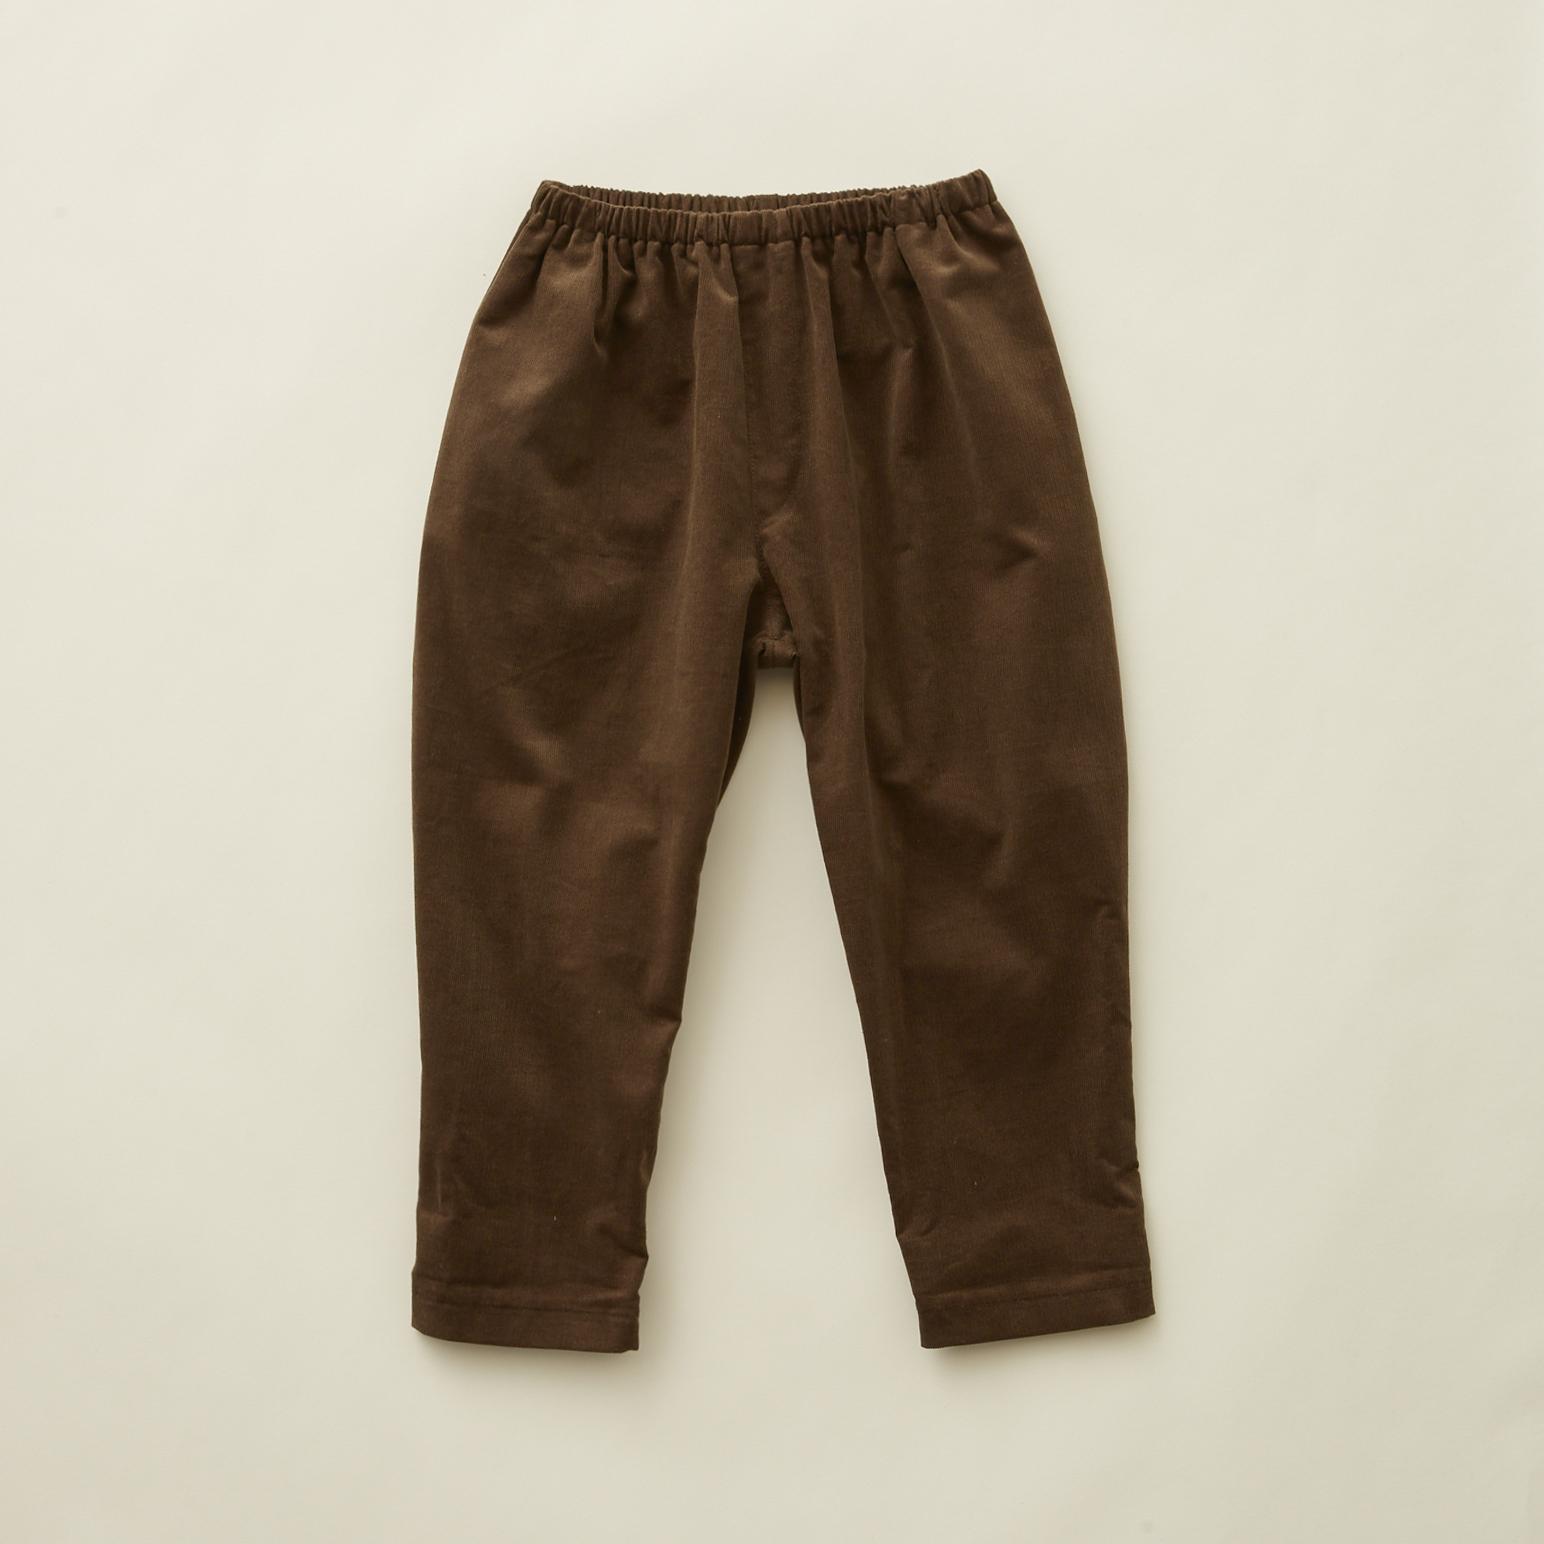 《eLfinFolk 2020AW》corduroy  pants / brown / 140cm